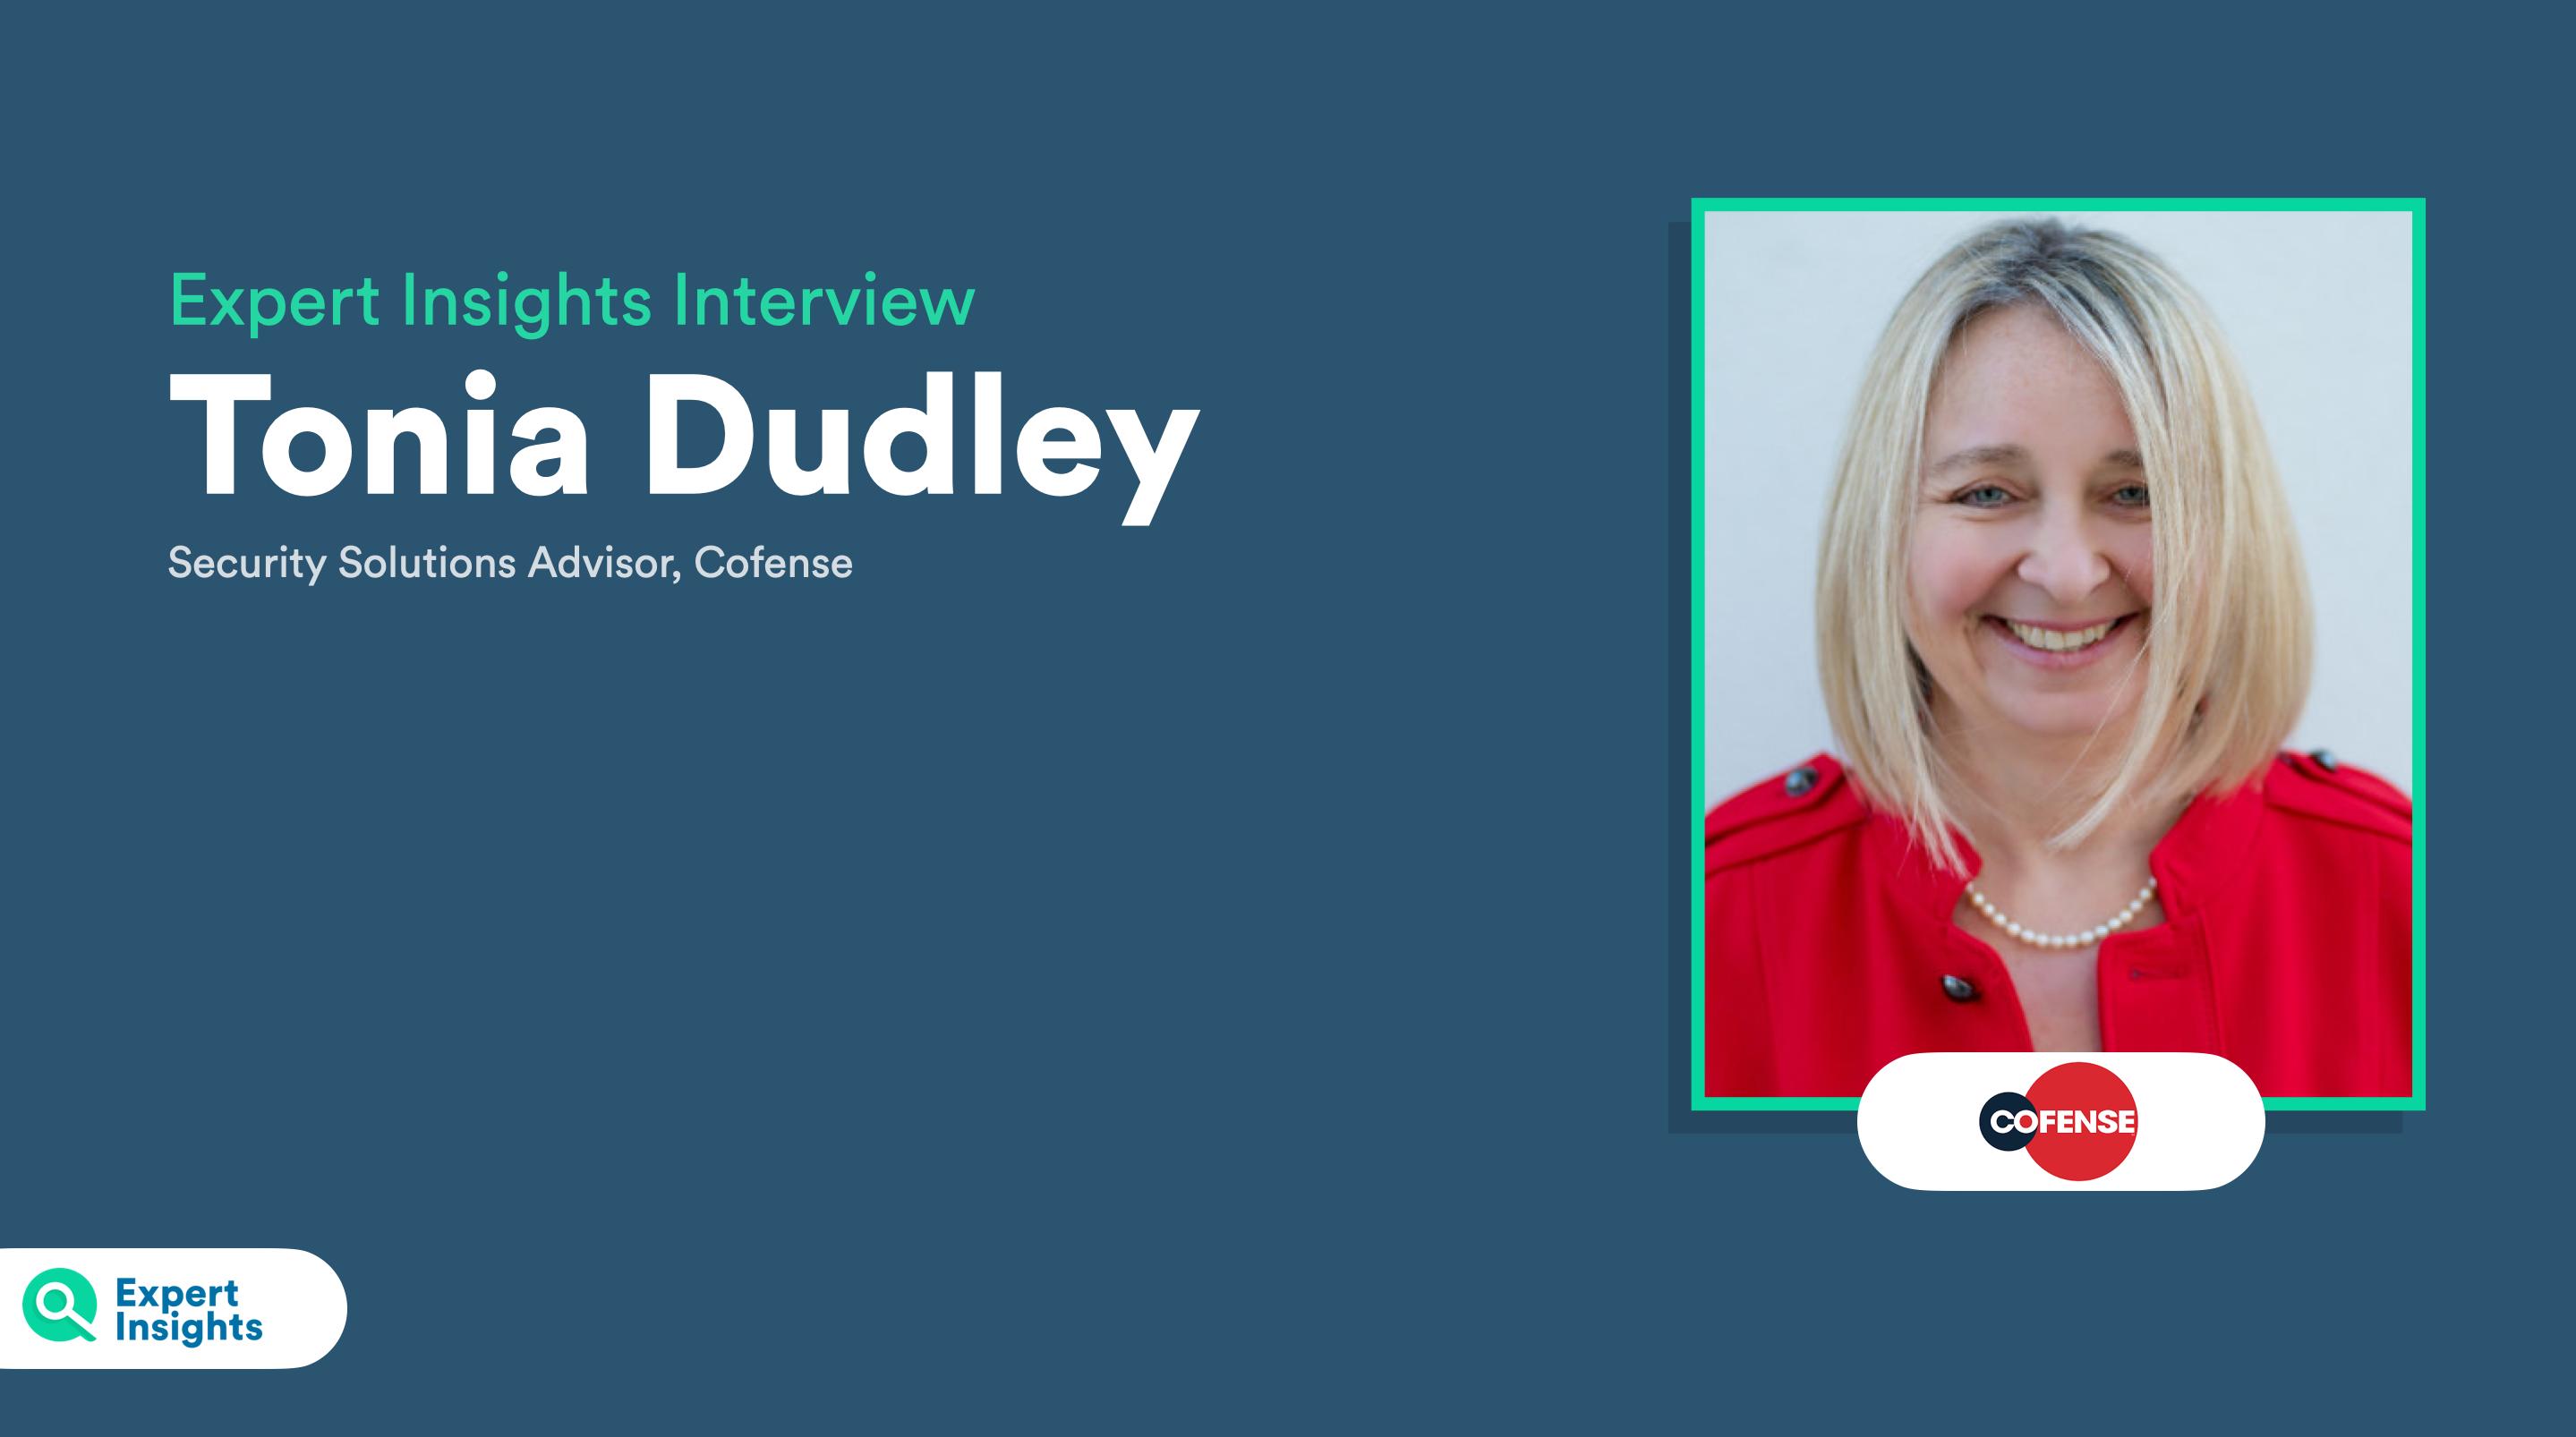 Tonia Dudley, Cofense Interview